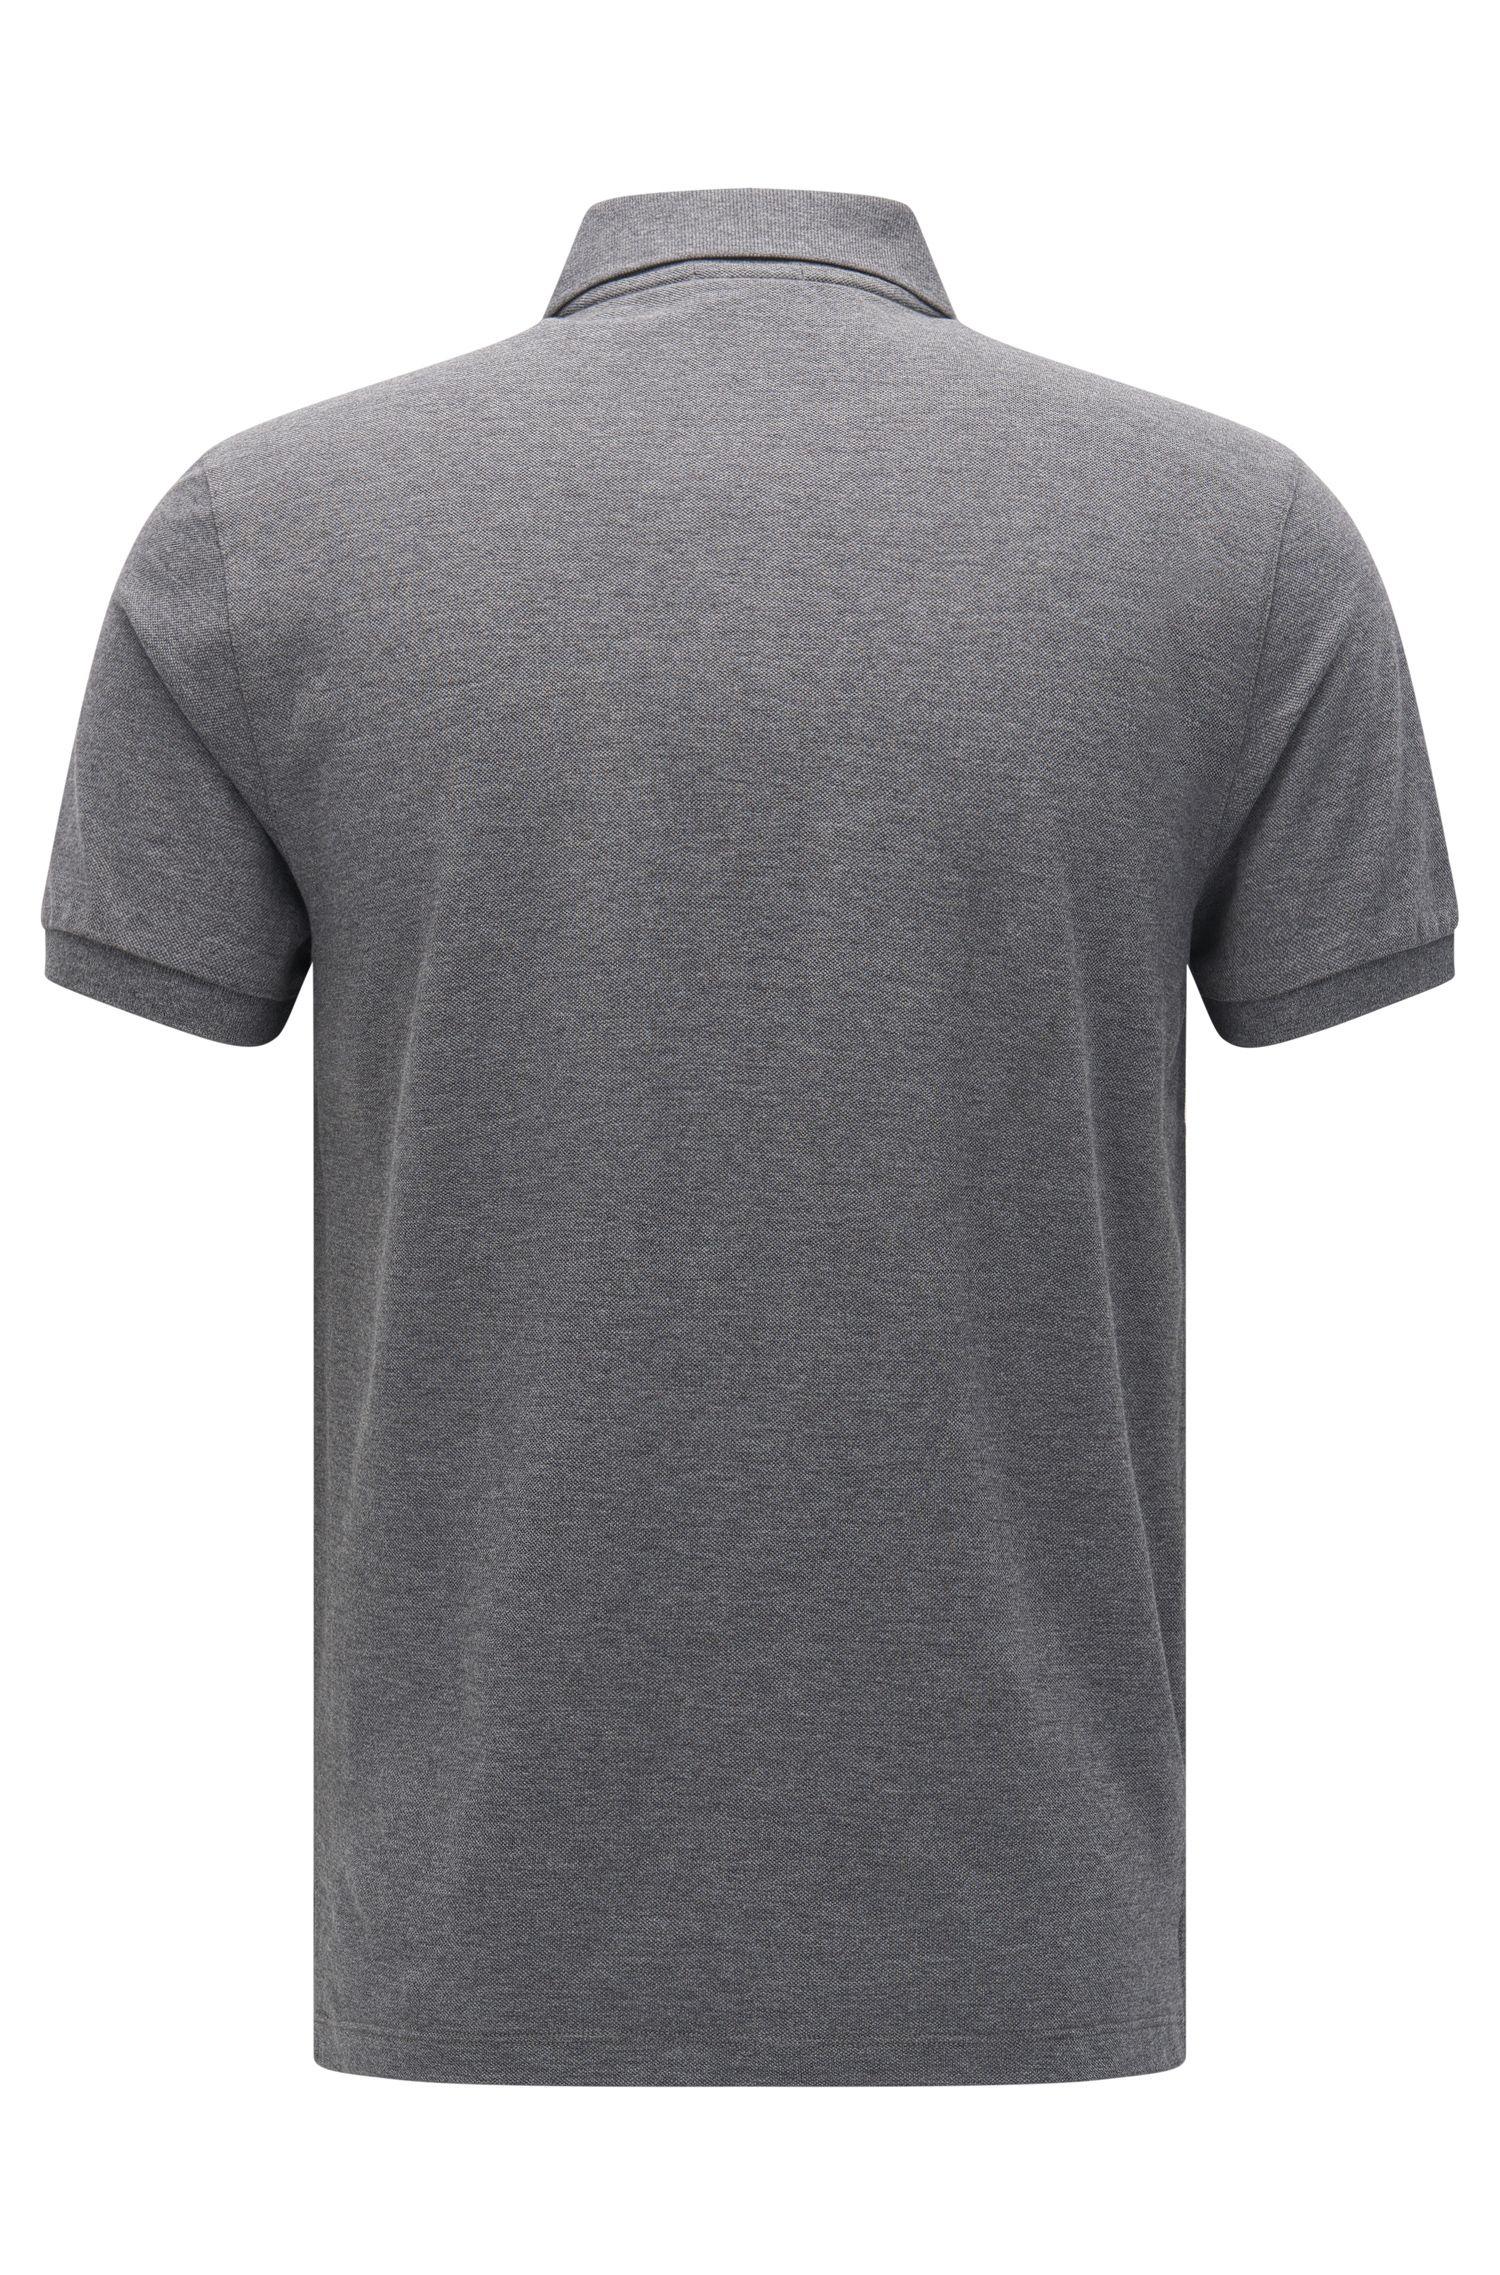 Regular-Fit Poloshirt aus Baumwolle: 'Pallas'